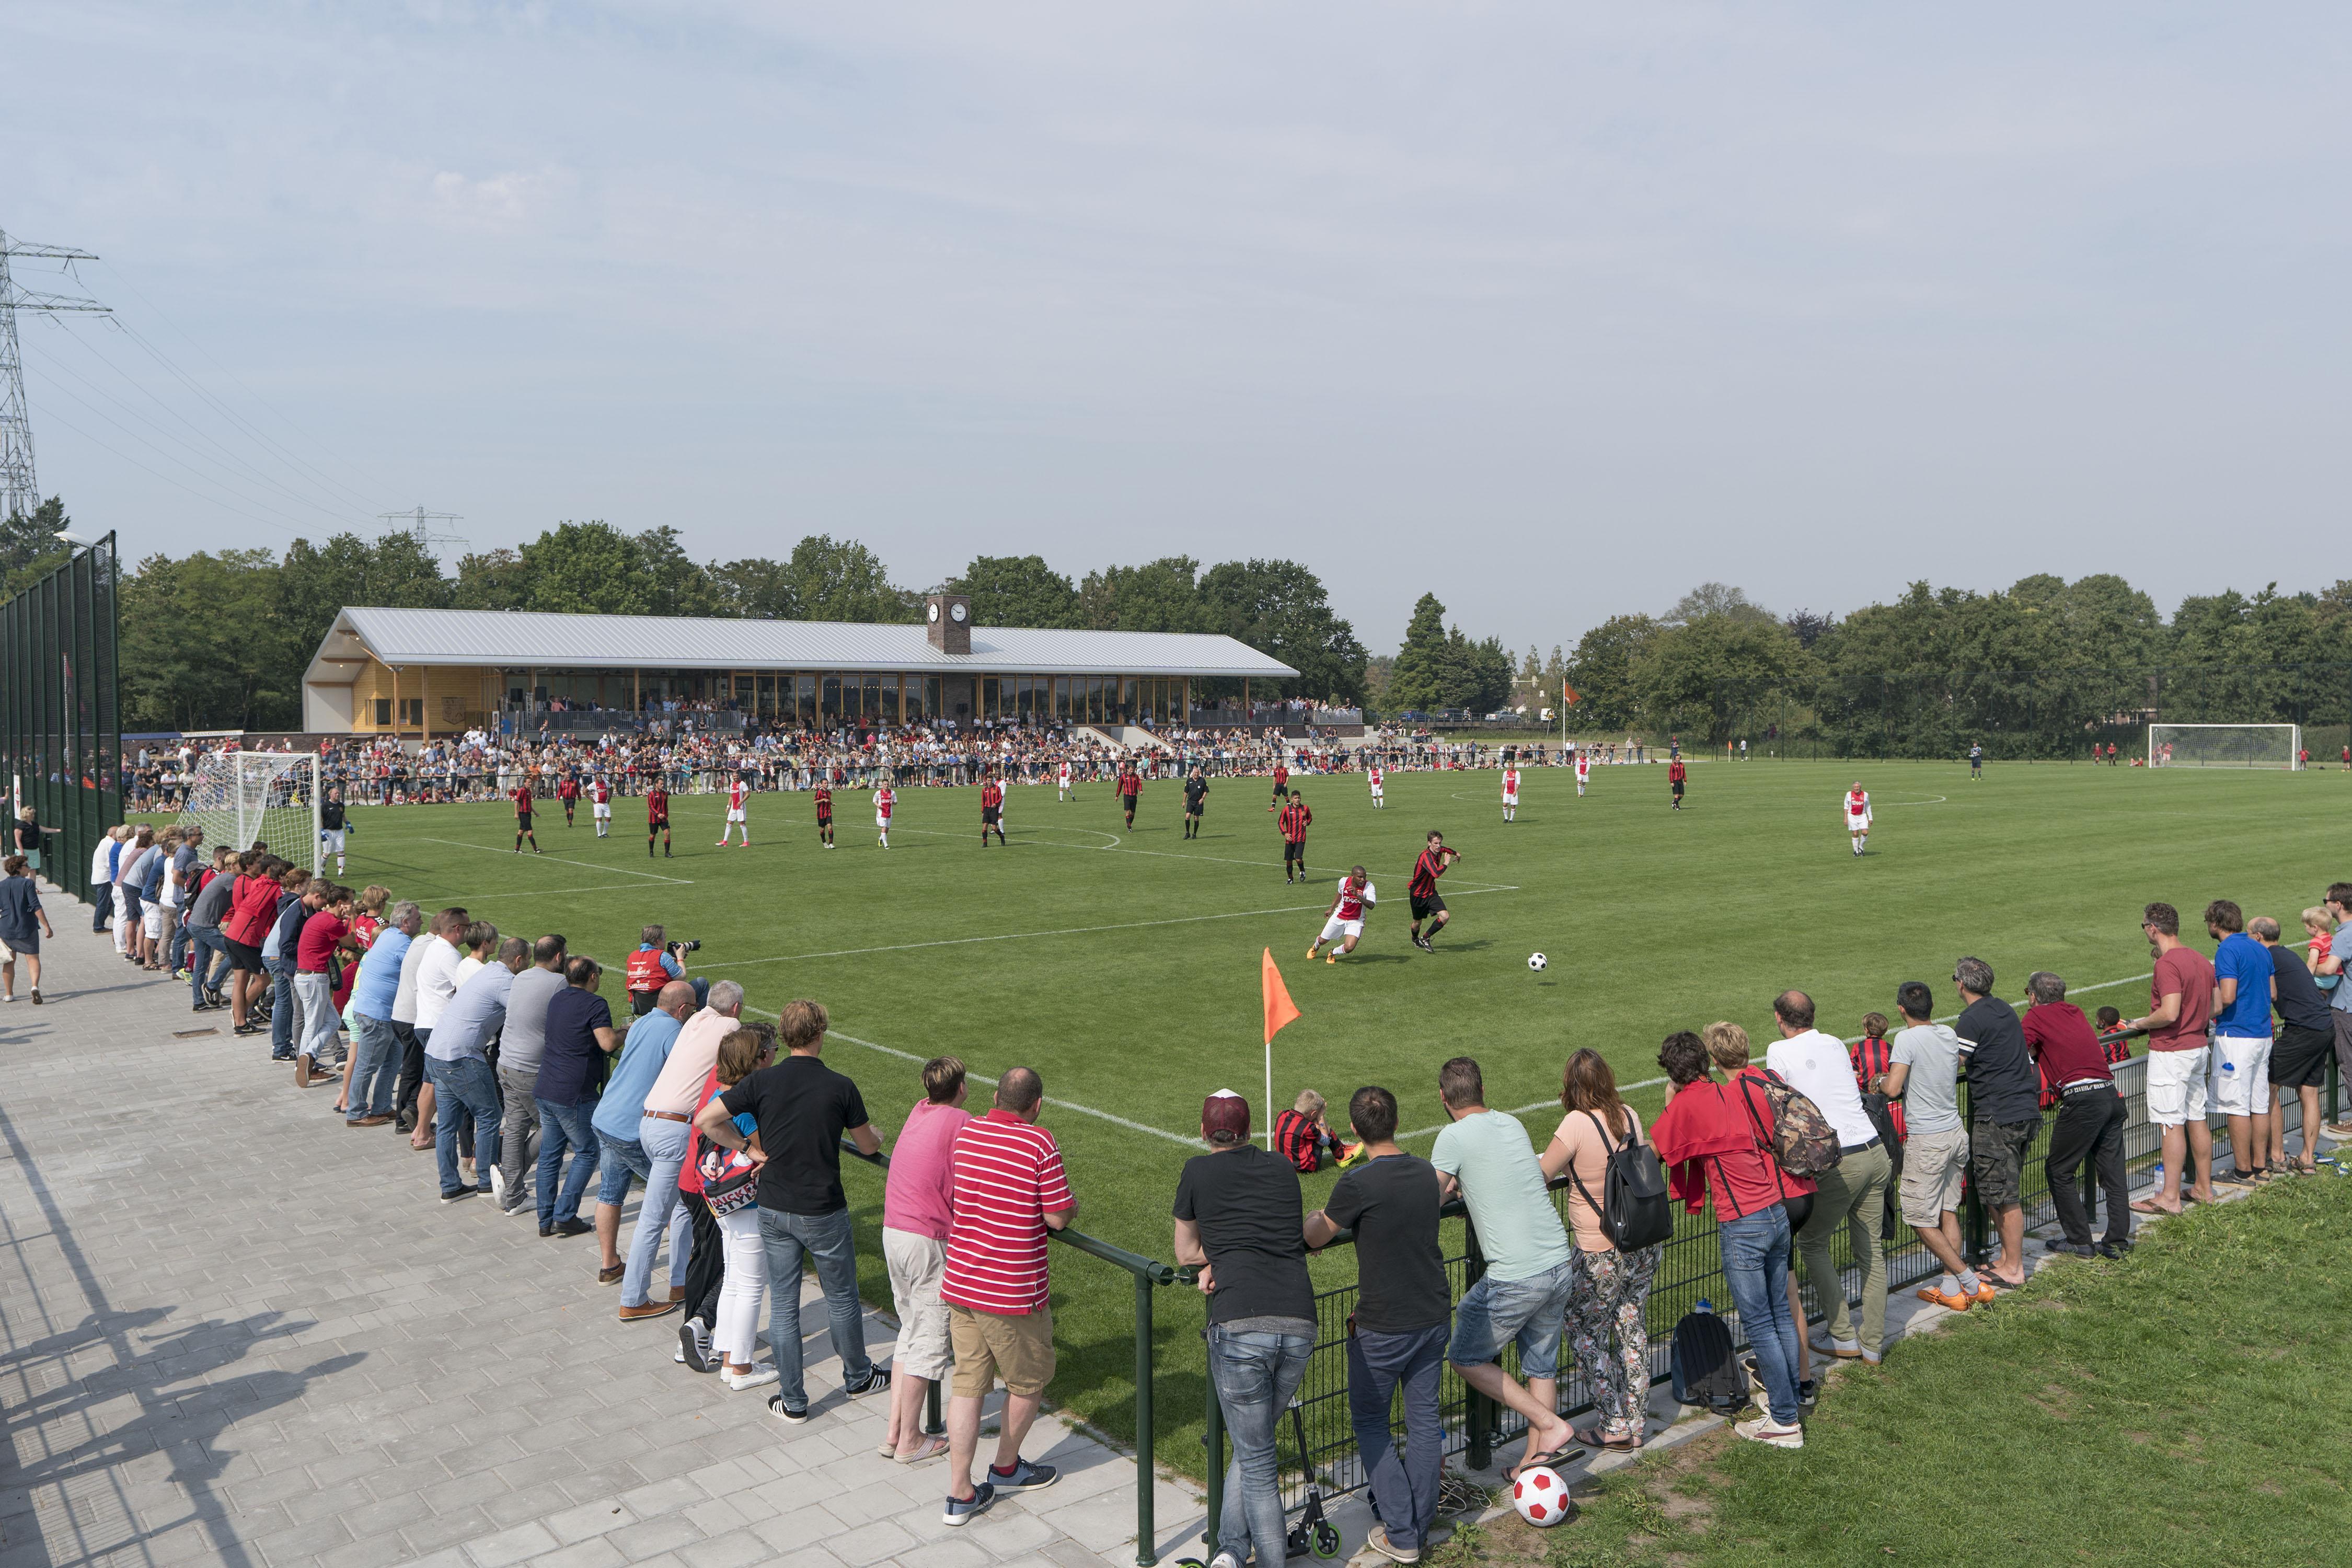 Voetbal- en cricketclub ASC uit Oegstgeest wil alsnog kunstgras